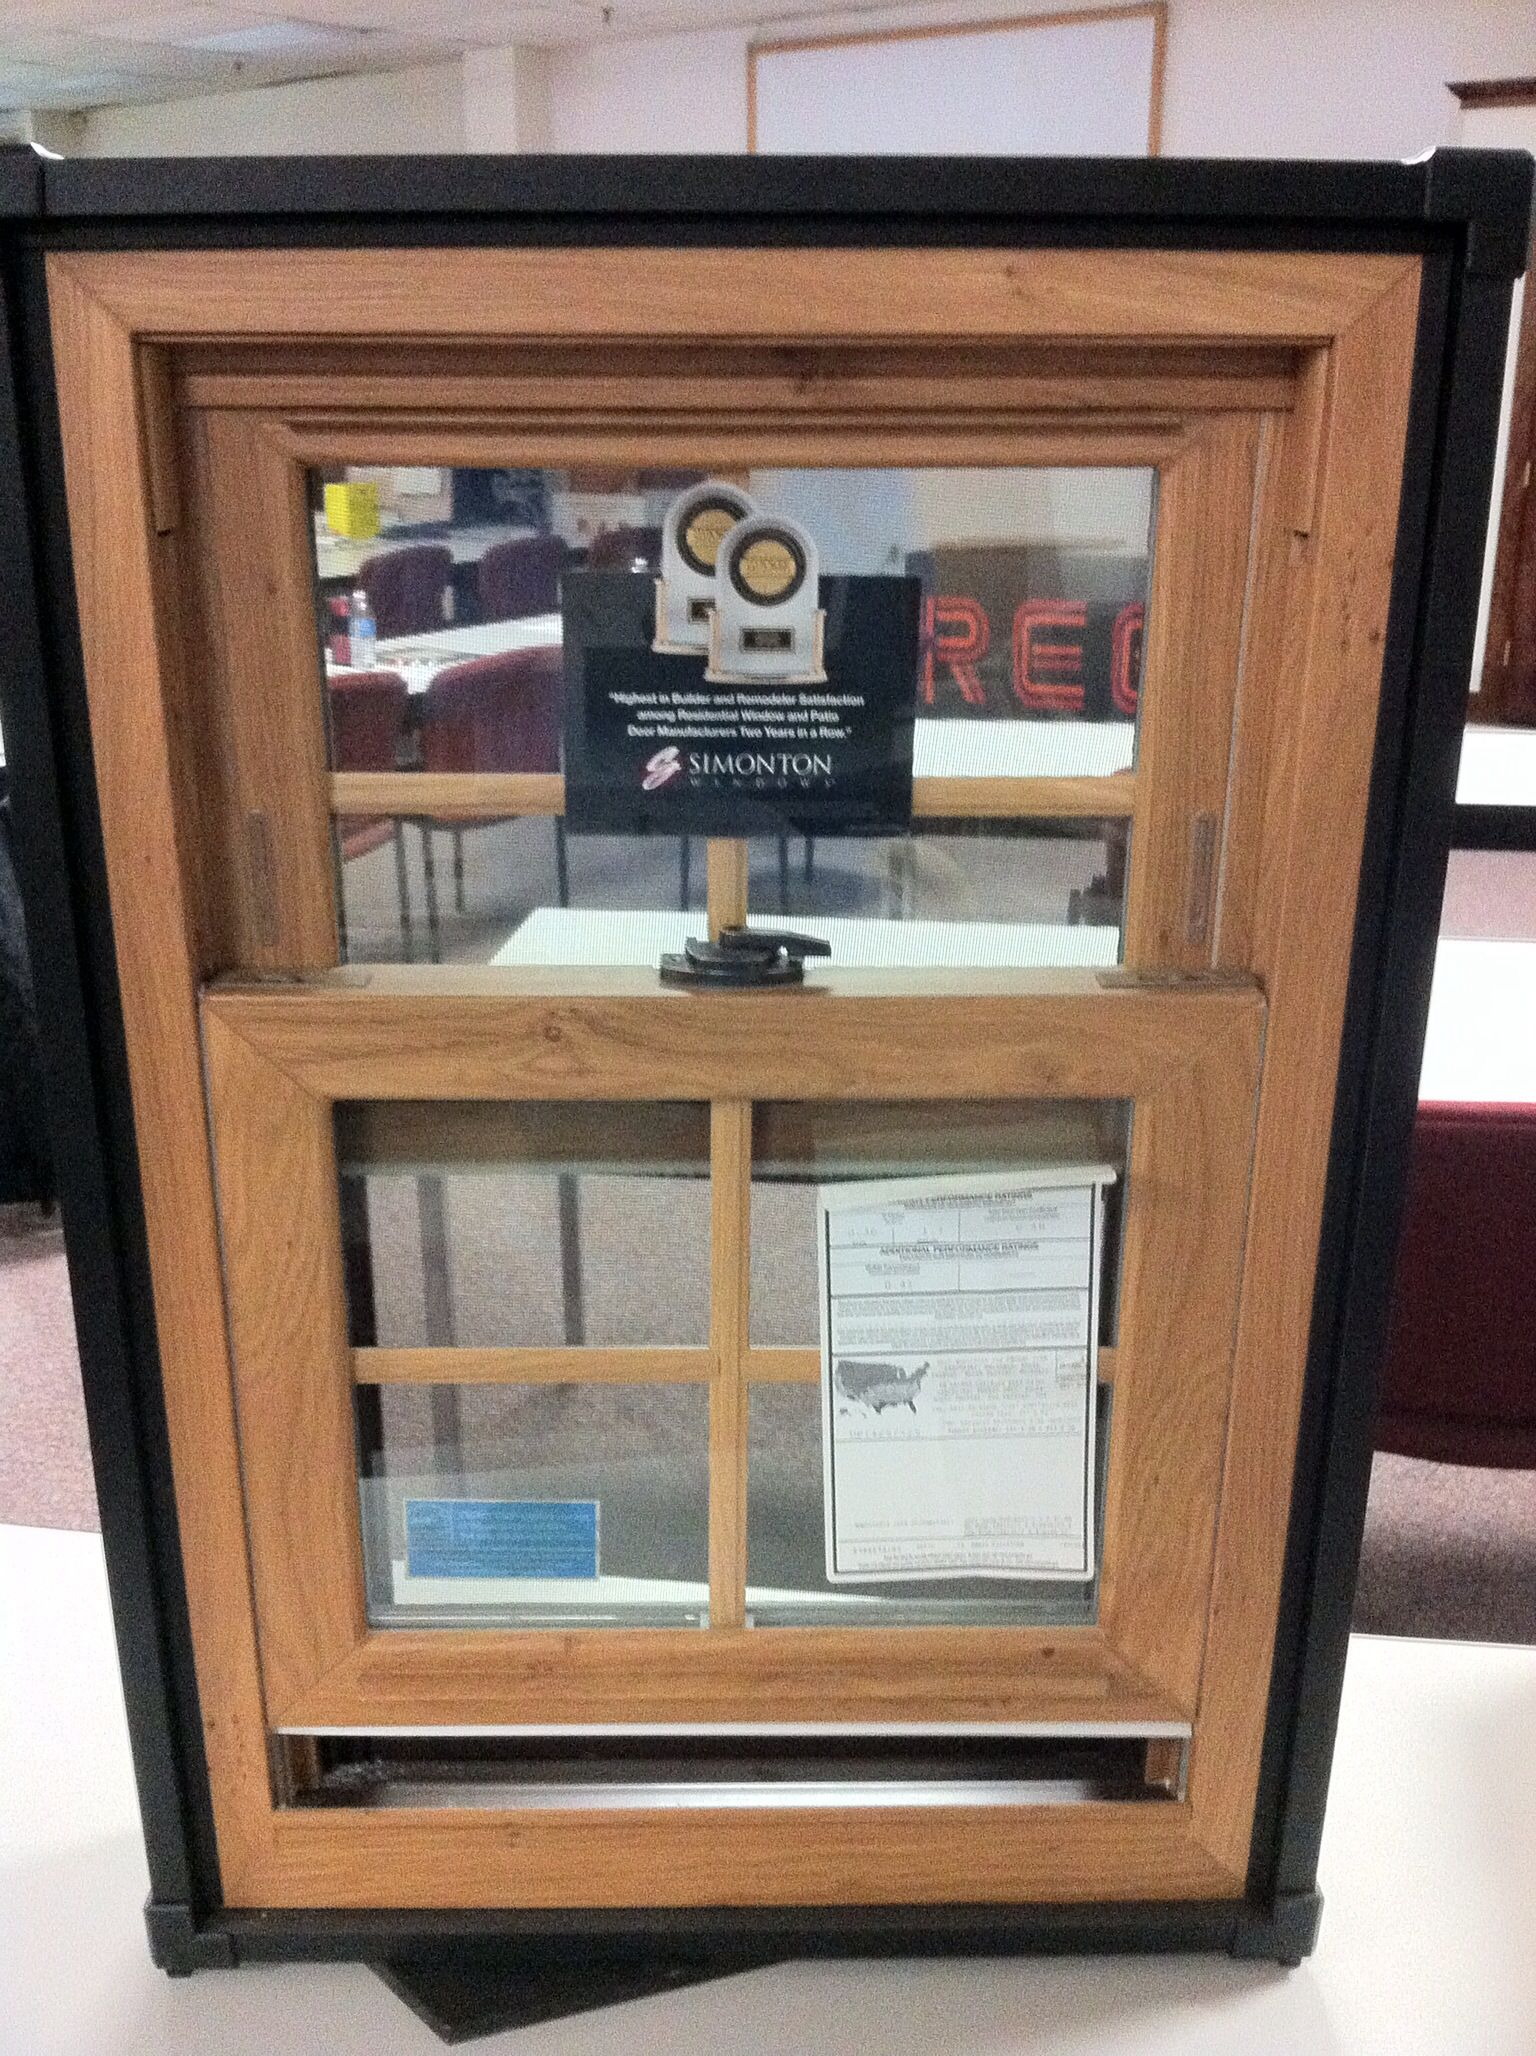 Simonton Vinyl Windows Reflections Series 5500 With Wood Finish On